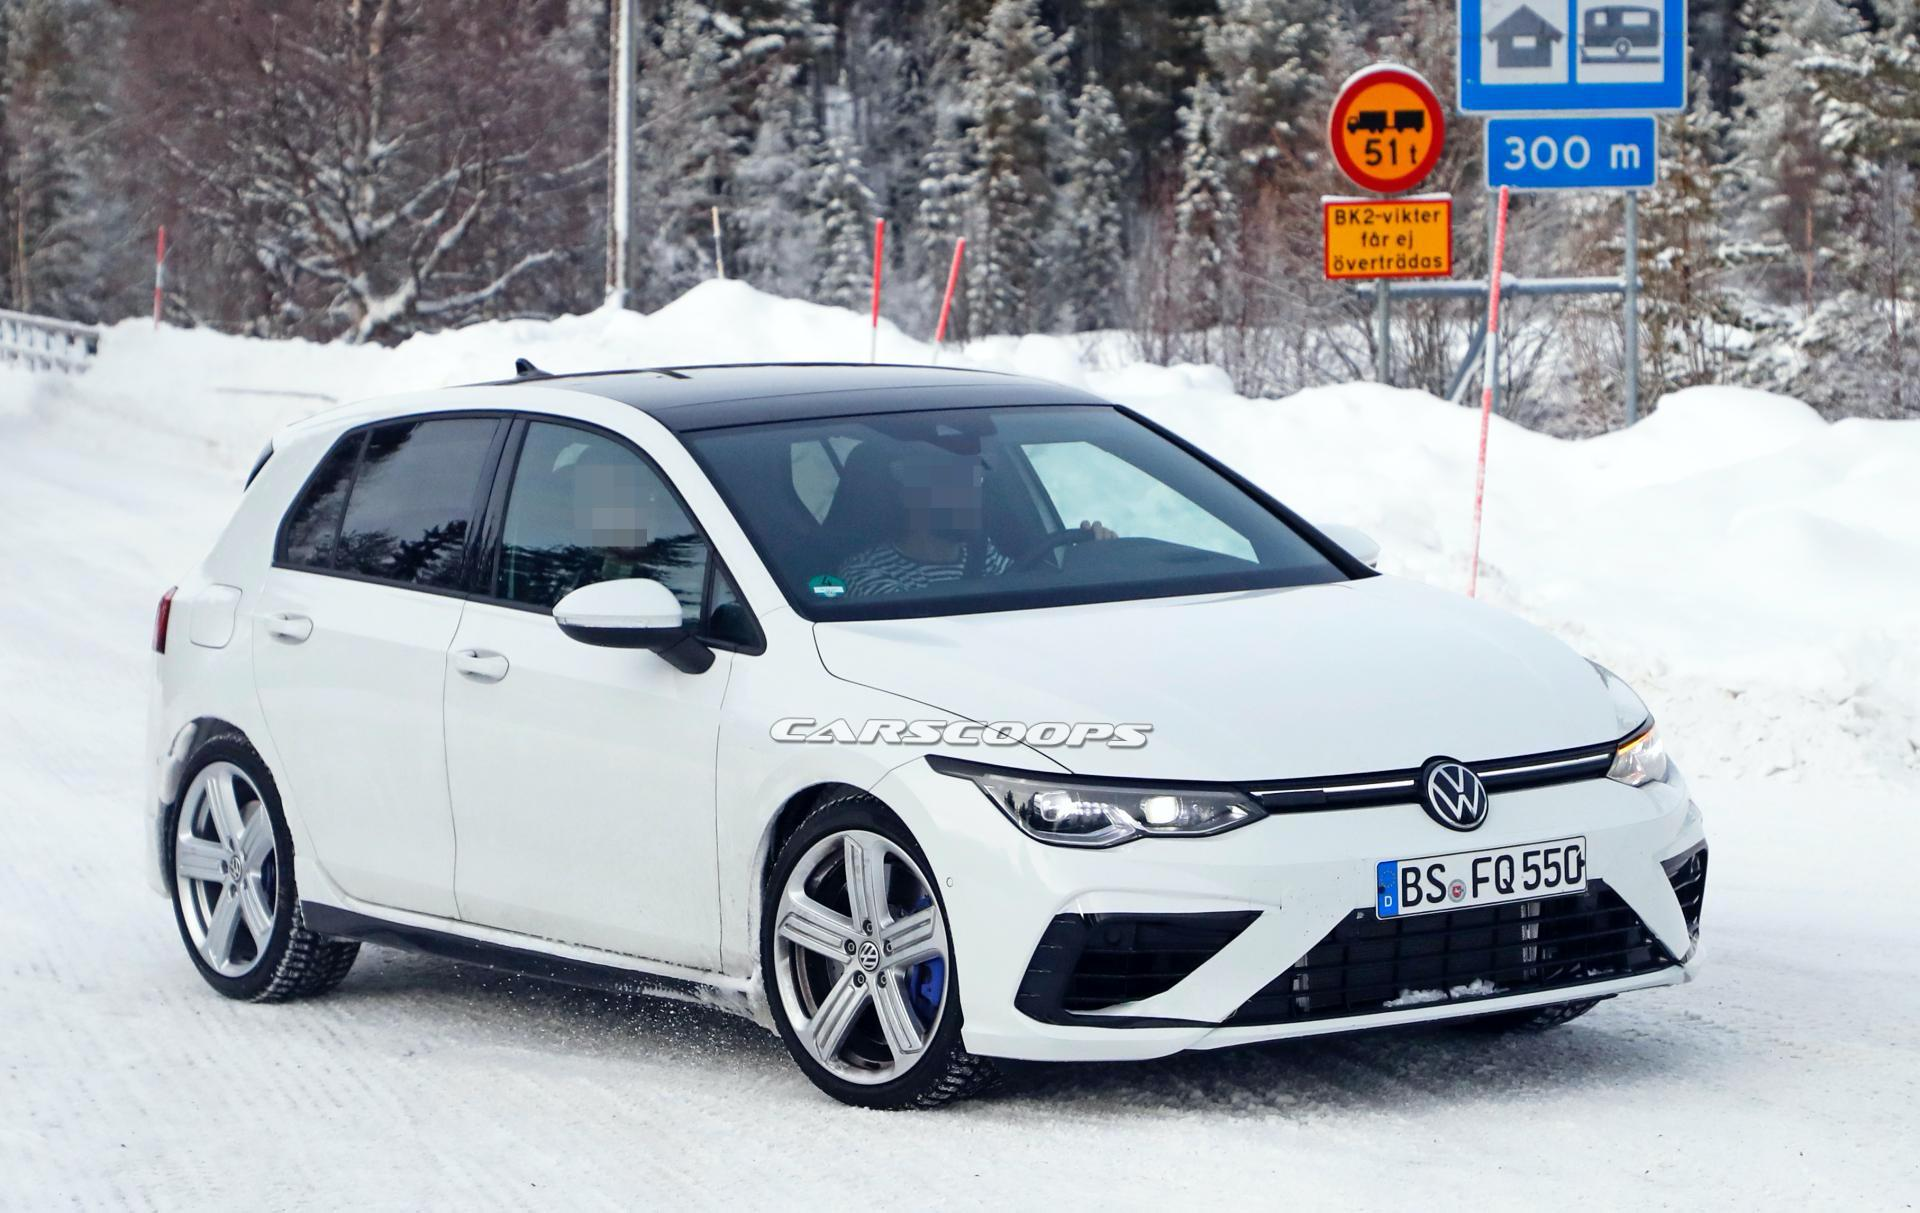 2020-VW-Golf-R-spy-shots-3